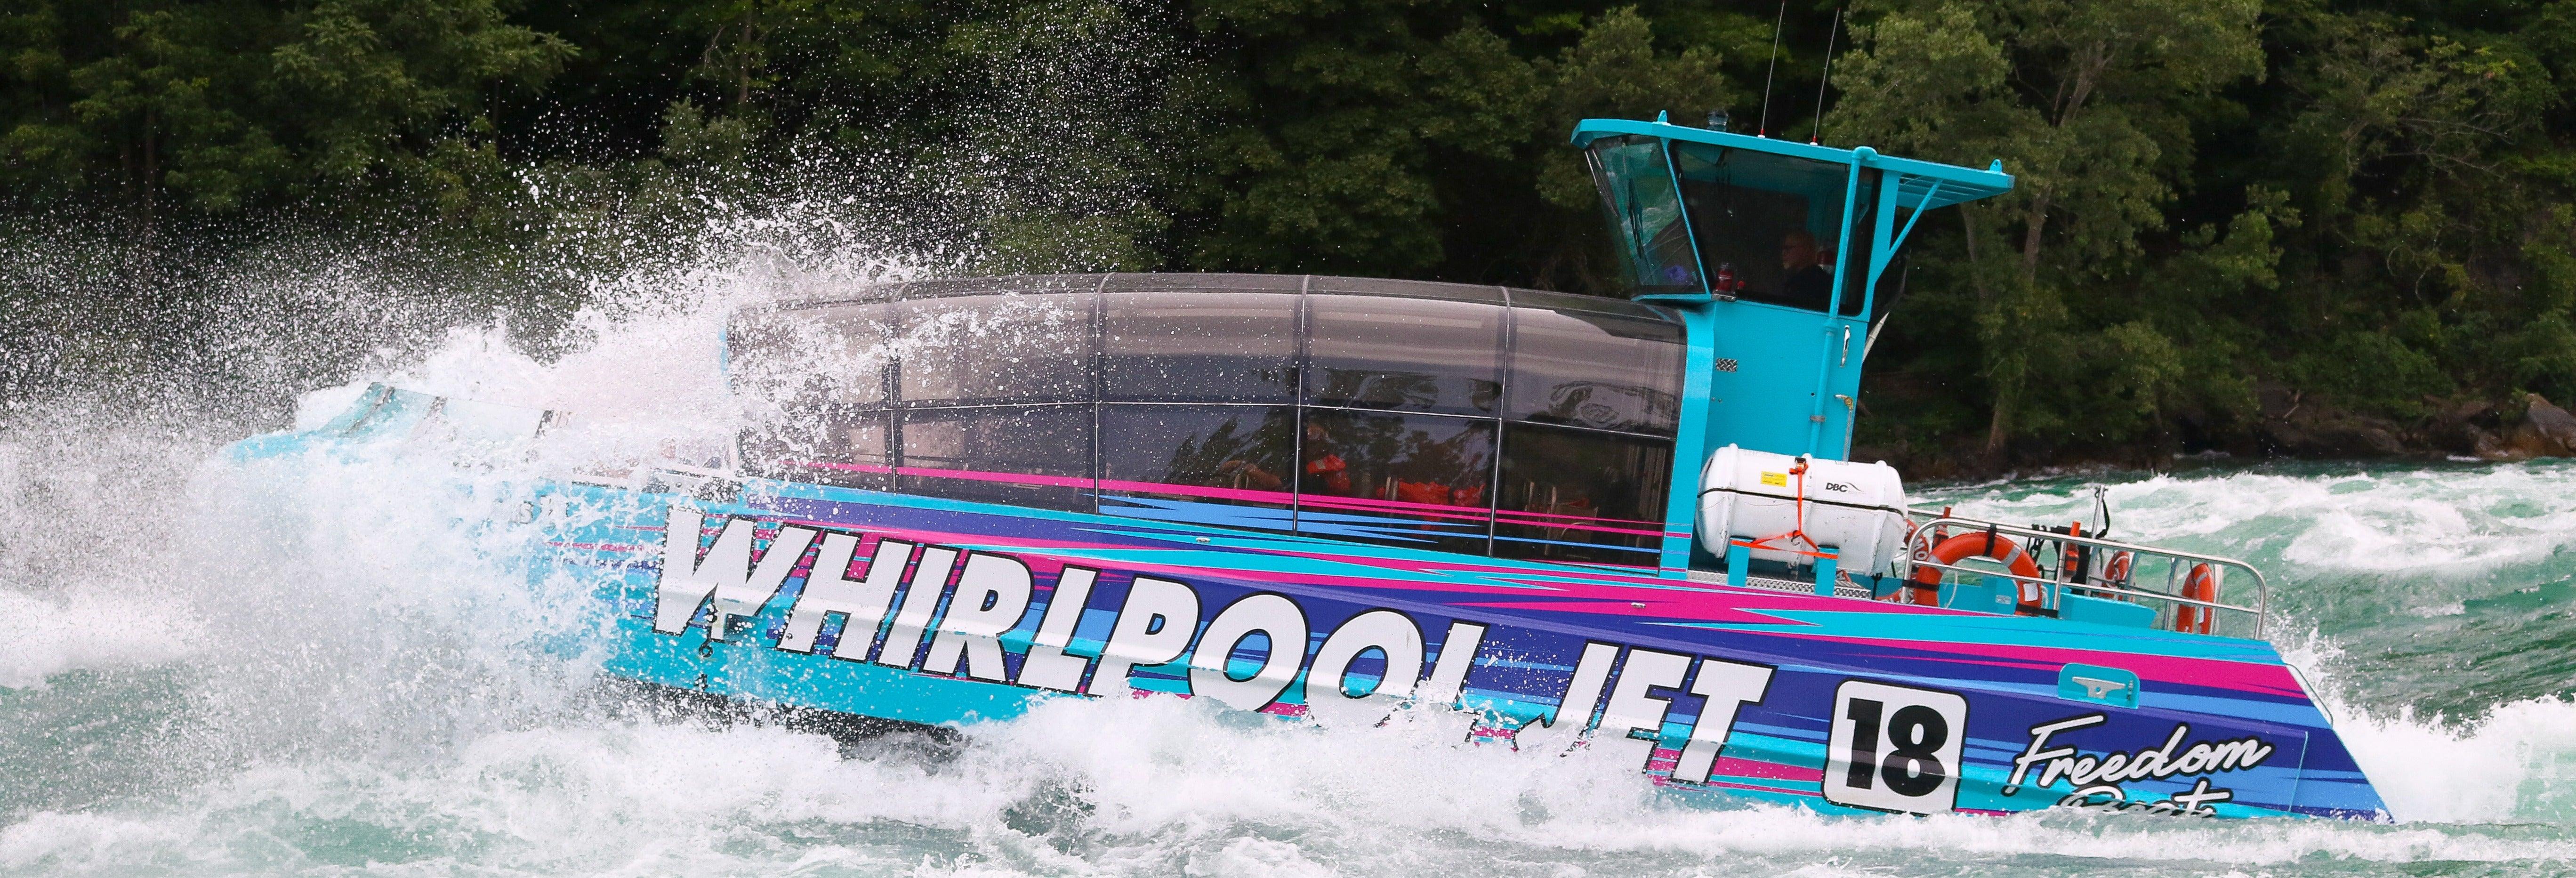 Giro sul fiume Niagara in motoscafo